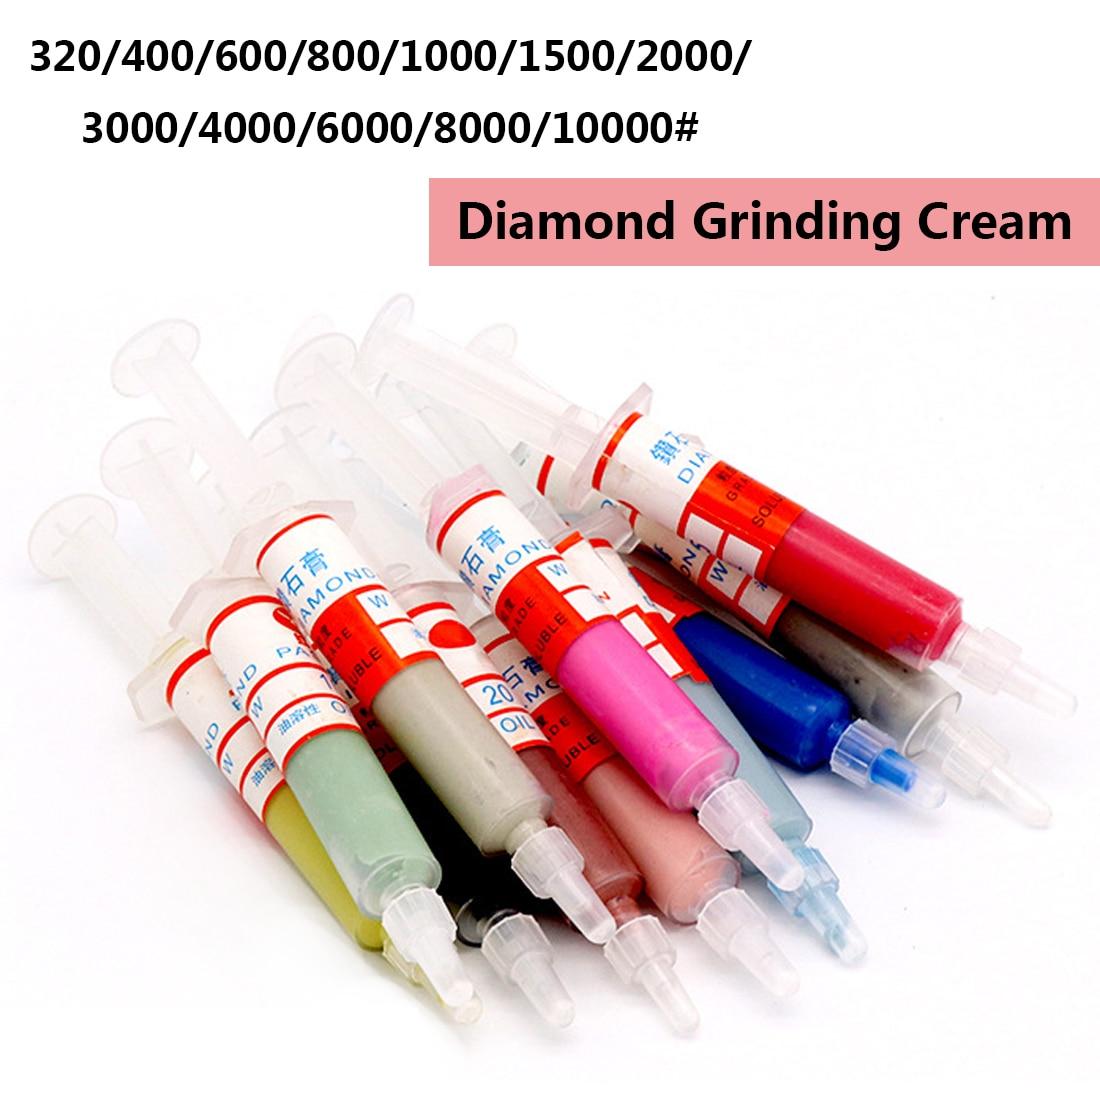 Grinding Polishing Power Tool Diamond Polishing Lapping Paste Compound Syringes Optional Micron Glass Metal Jade Abrasive Tools